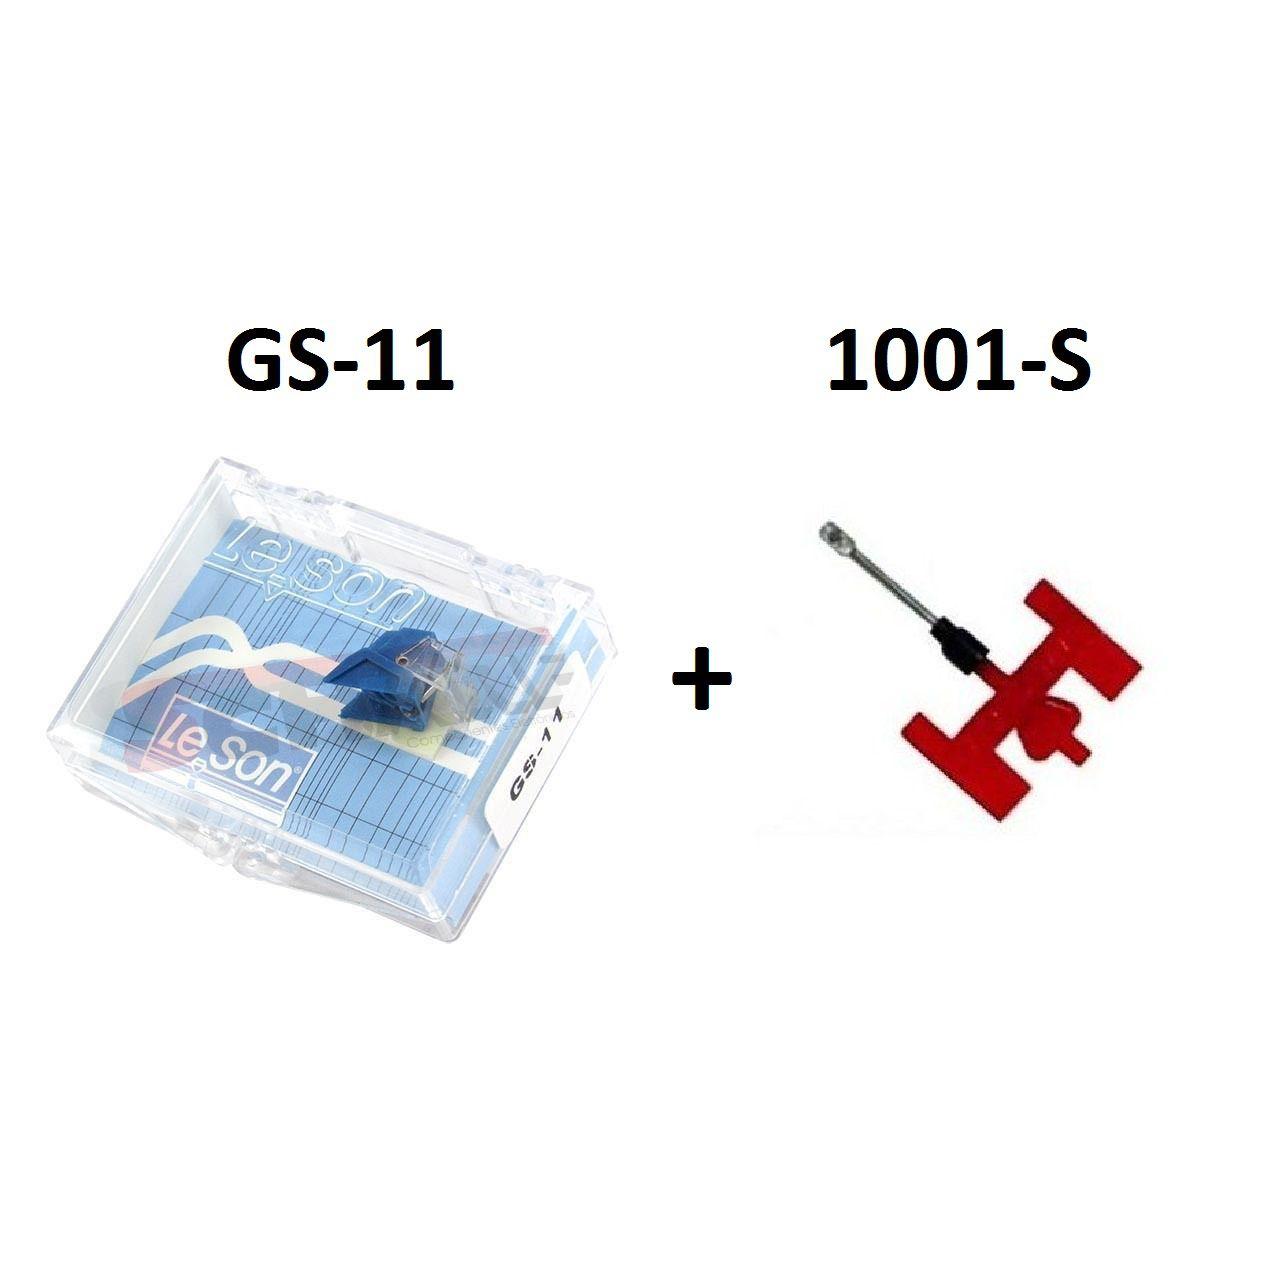 Kit Agulha Para Toca Discos e Vitrola Leson 1001-S + GS-11